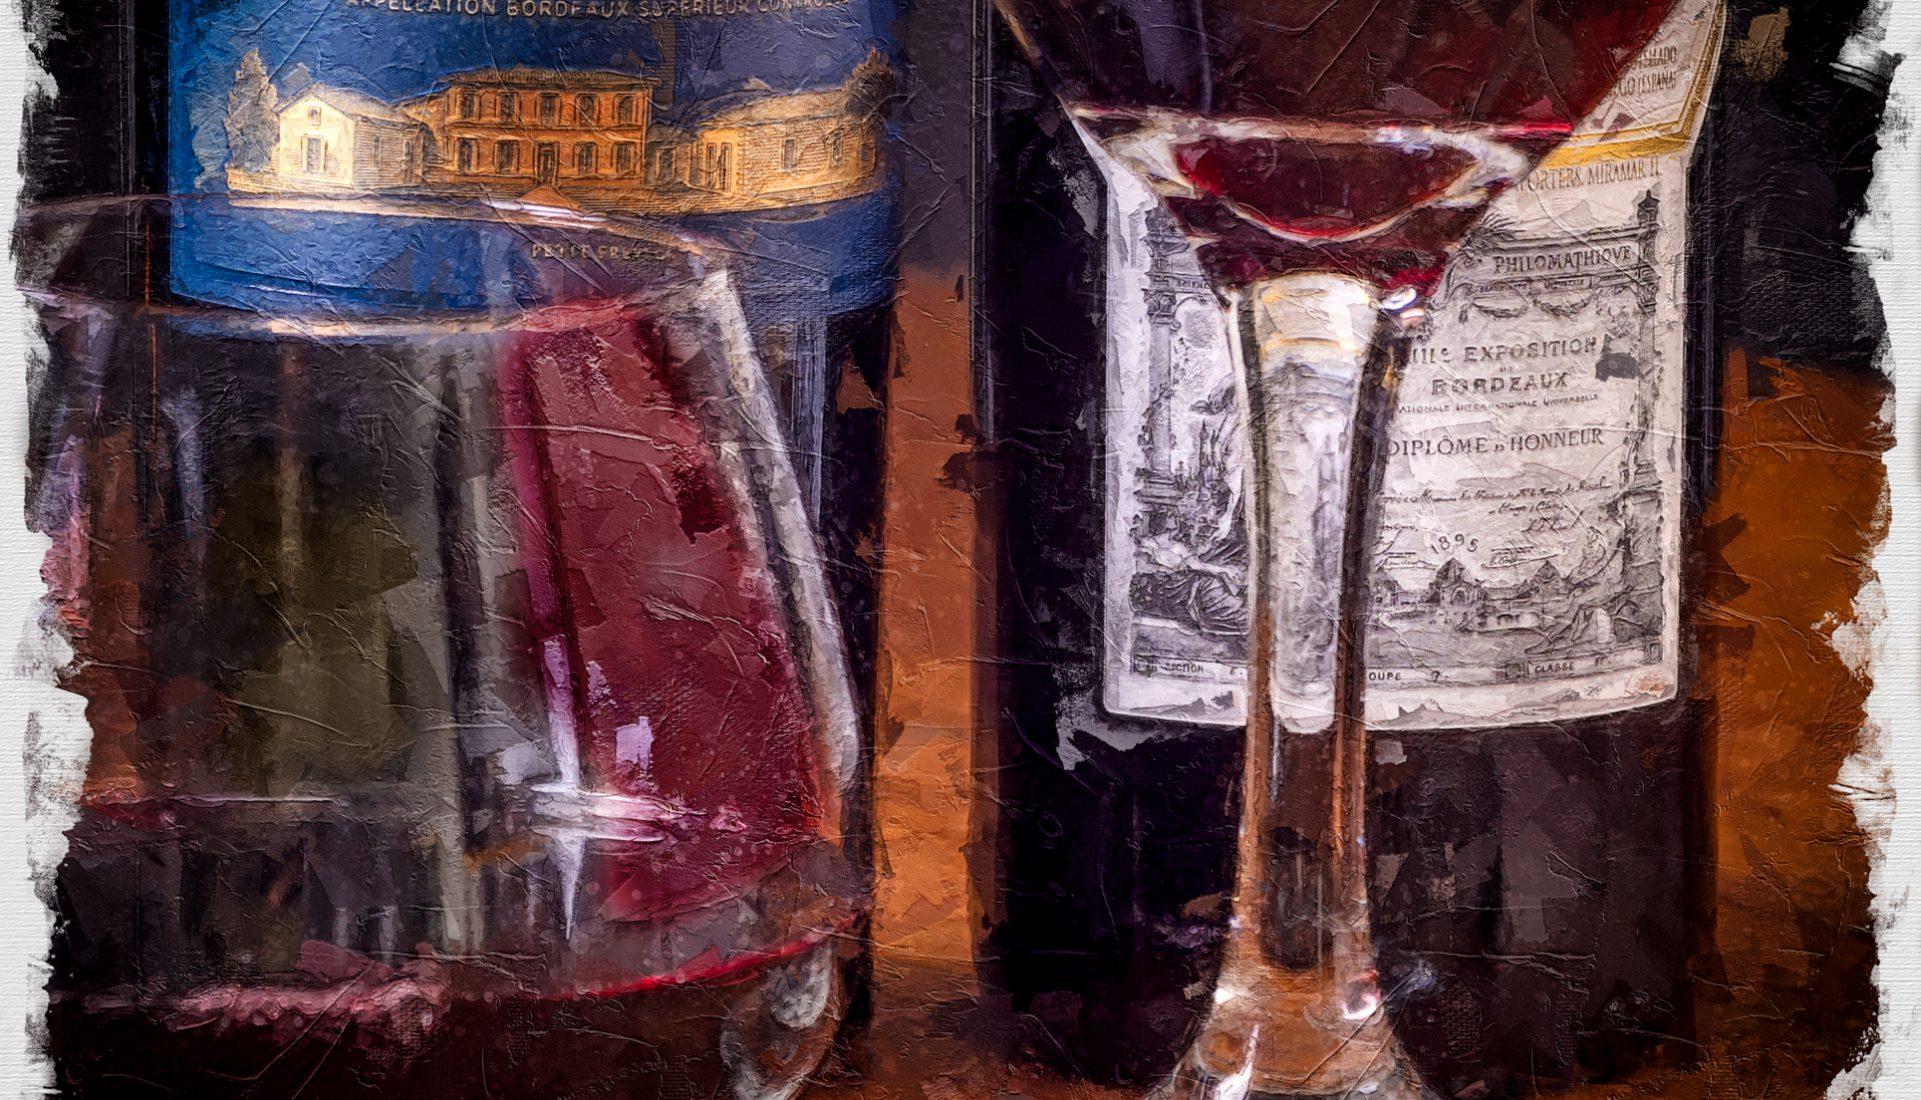 Bordeaux 1989 – a Variation On a Theme